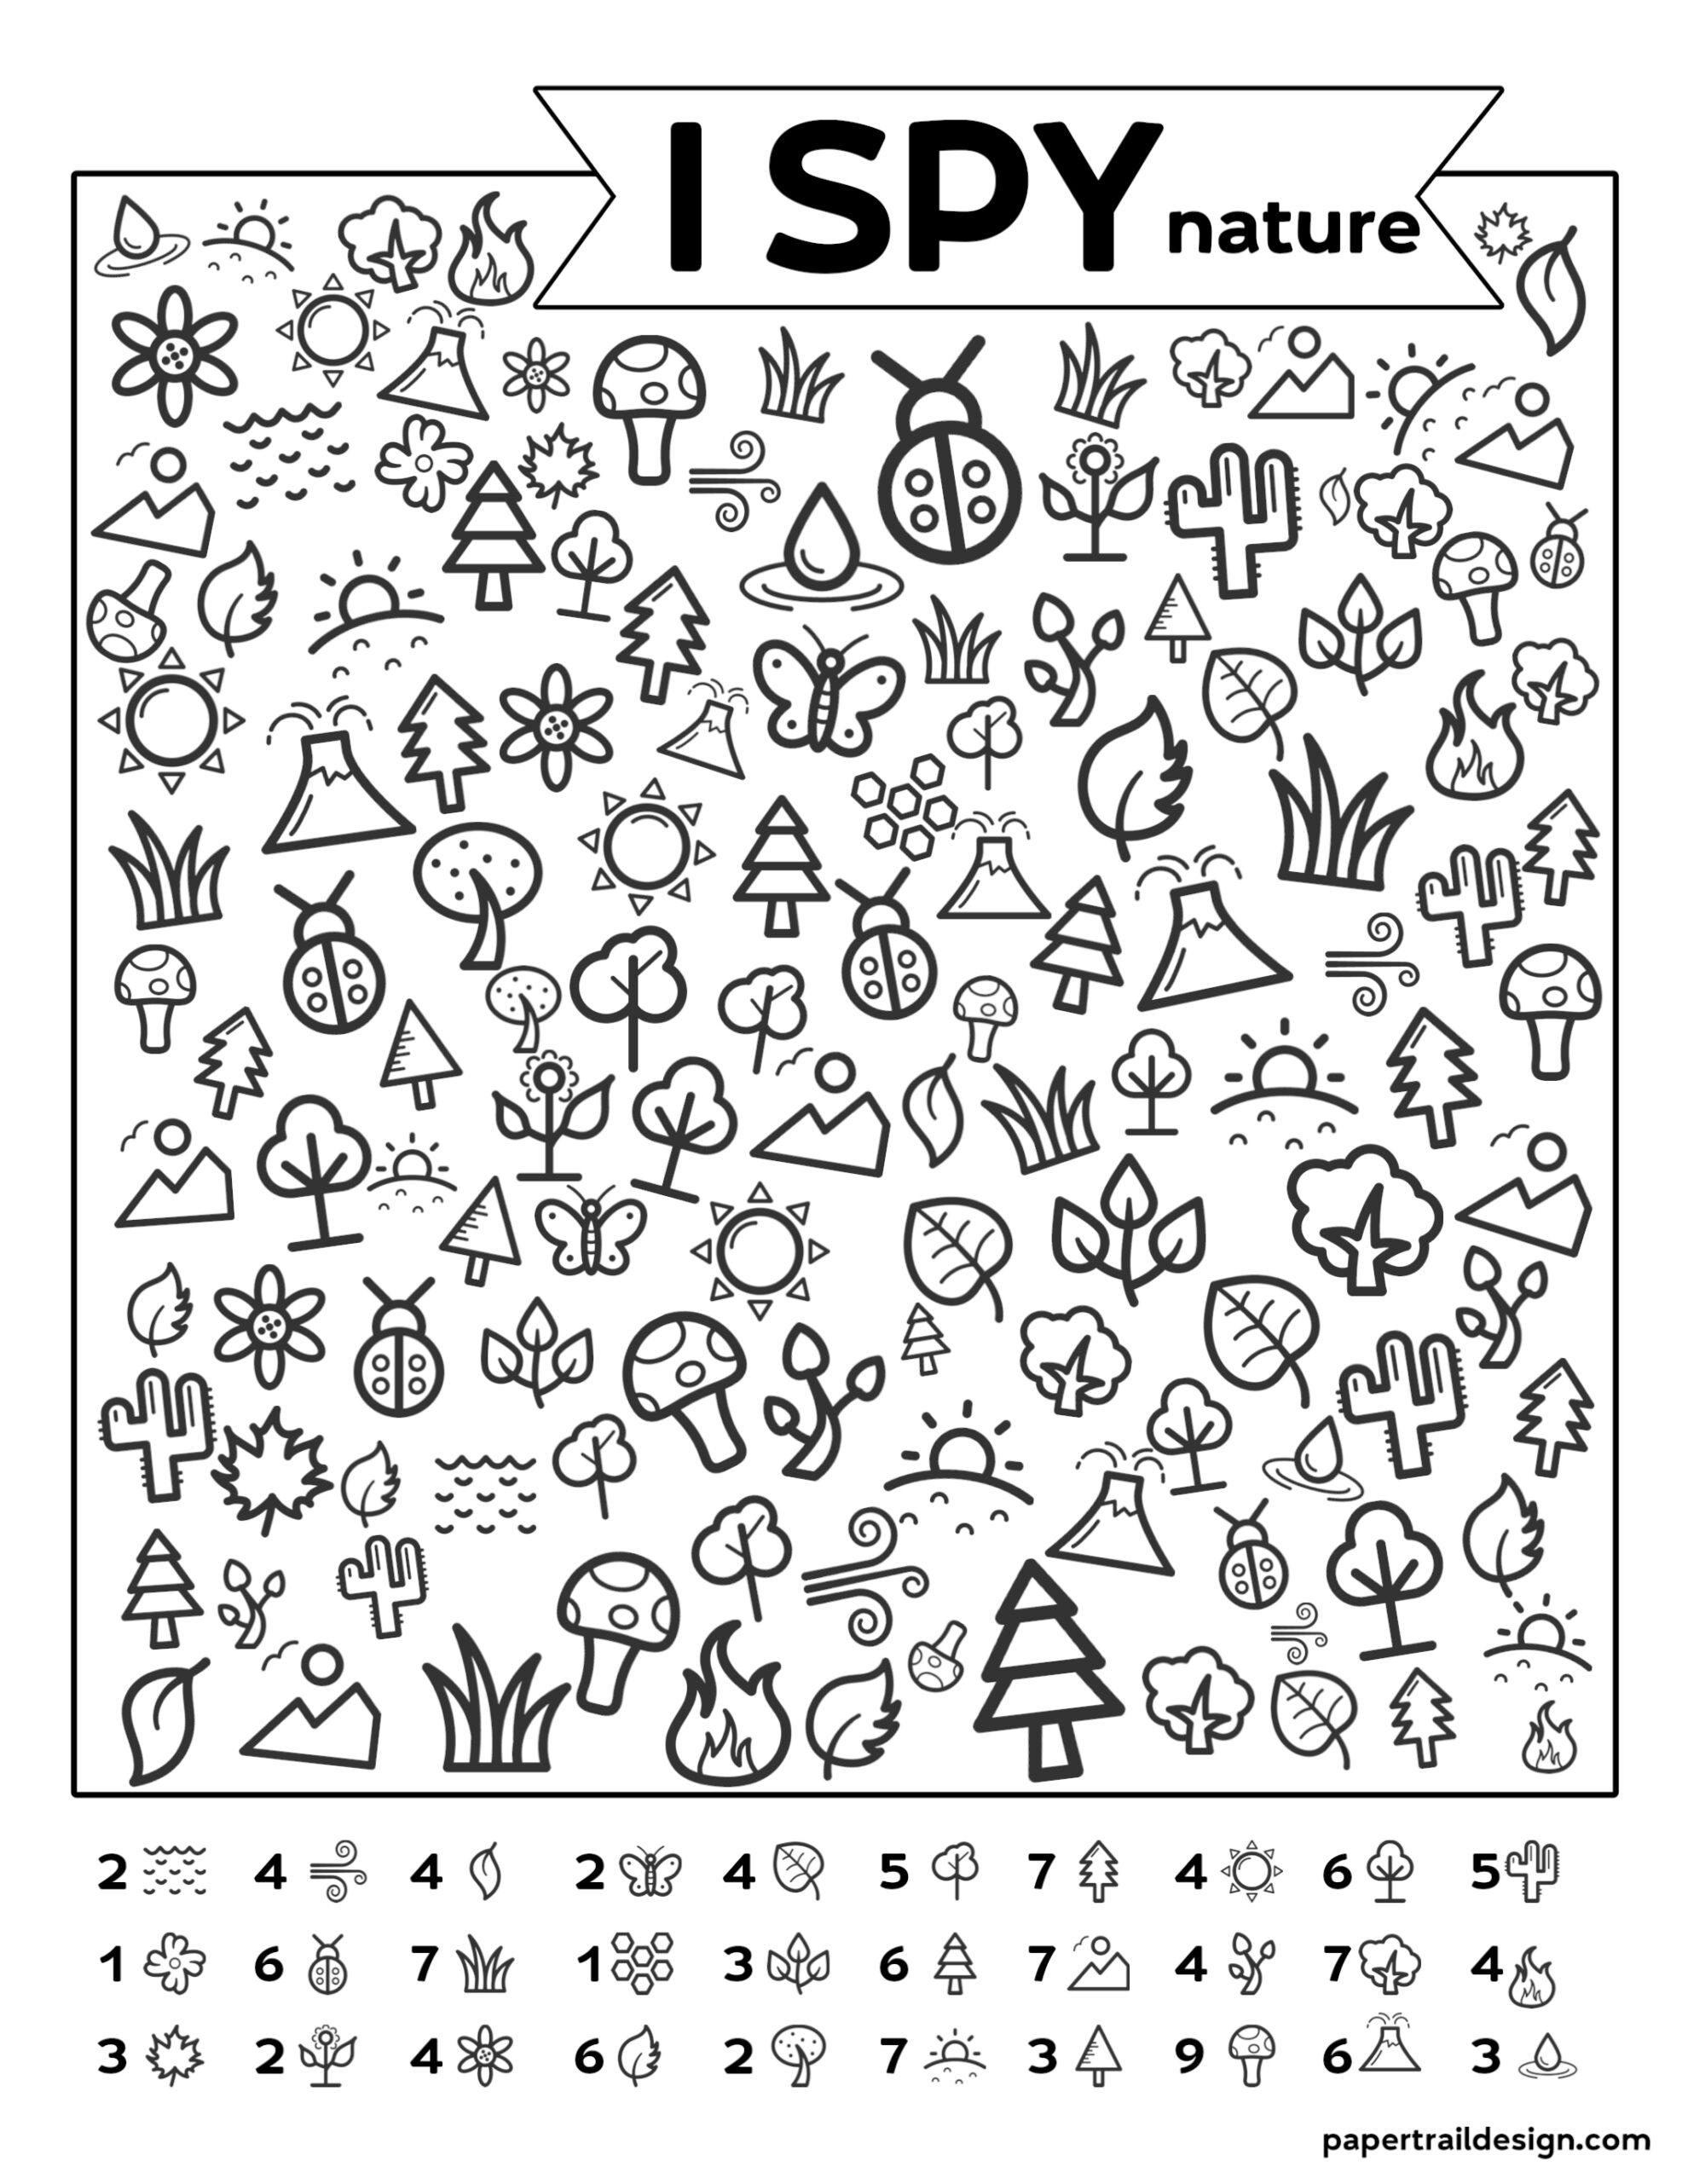 Free Printable I Spy Nature Game Paper Trail Design